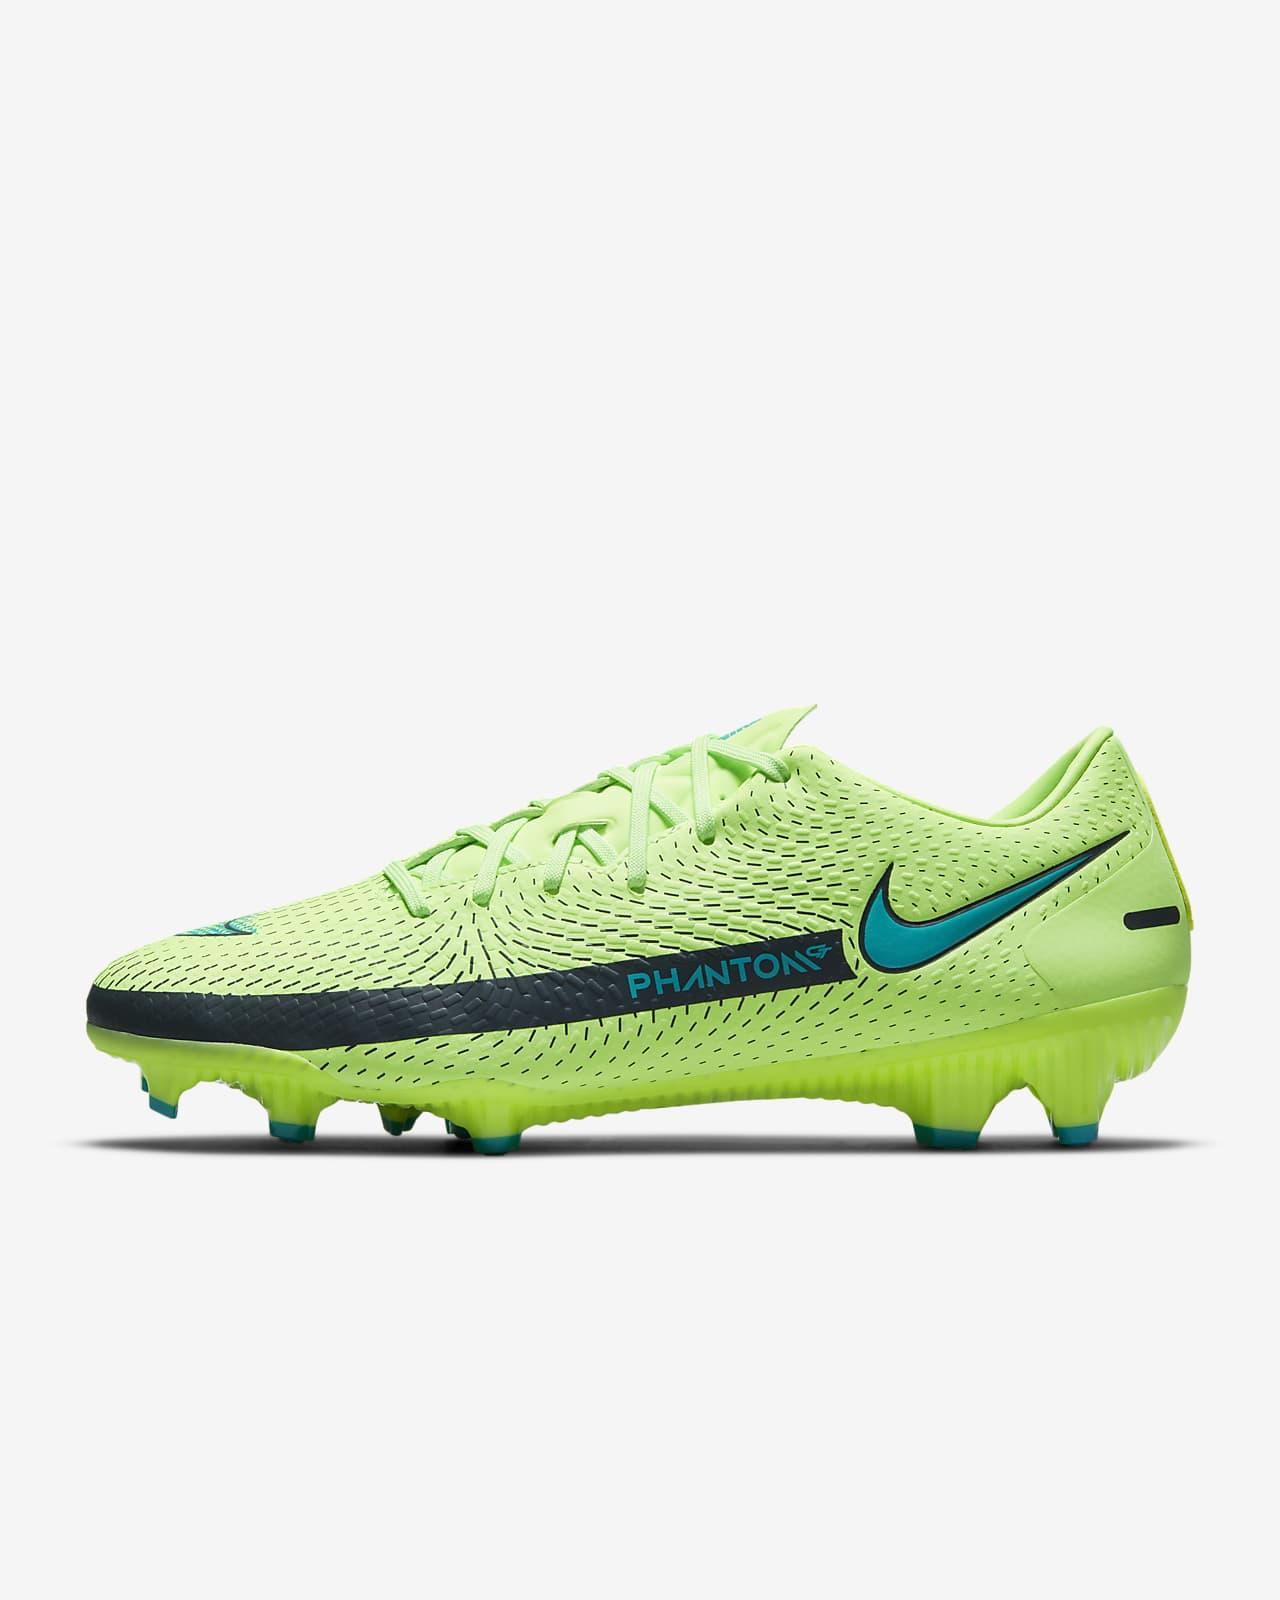 Nike Phantom GT Academy MG Multi-Ground Football Boot